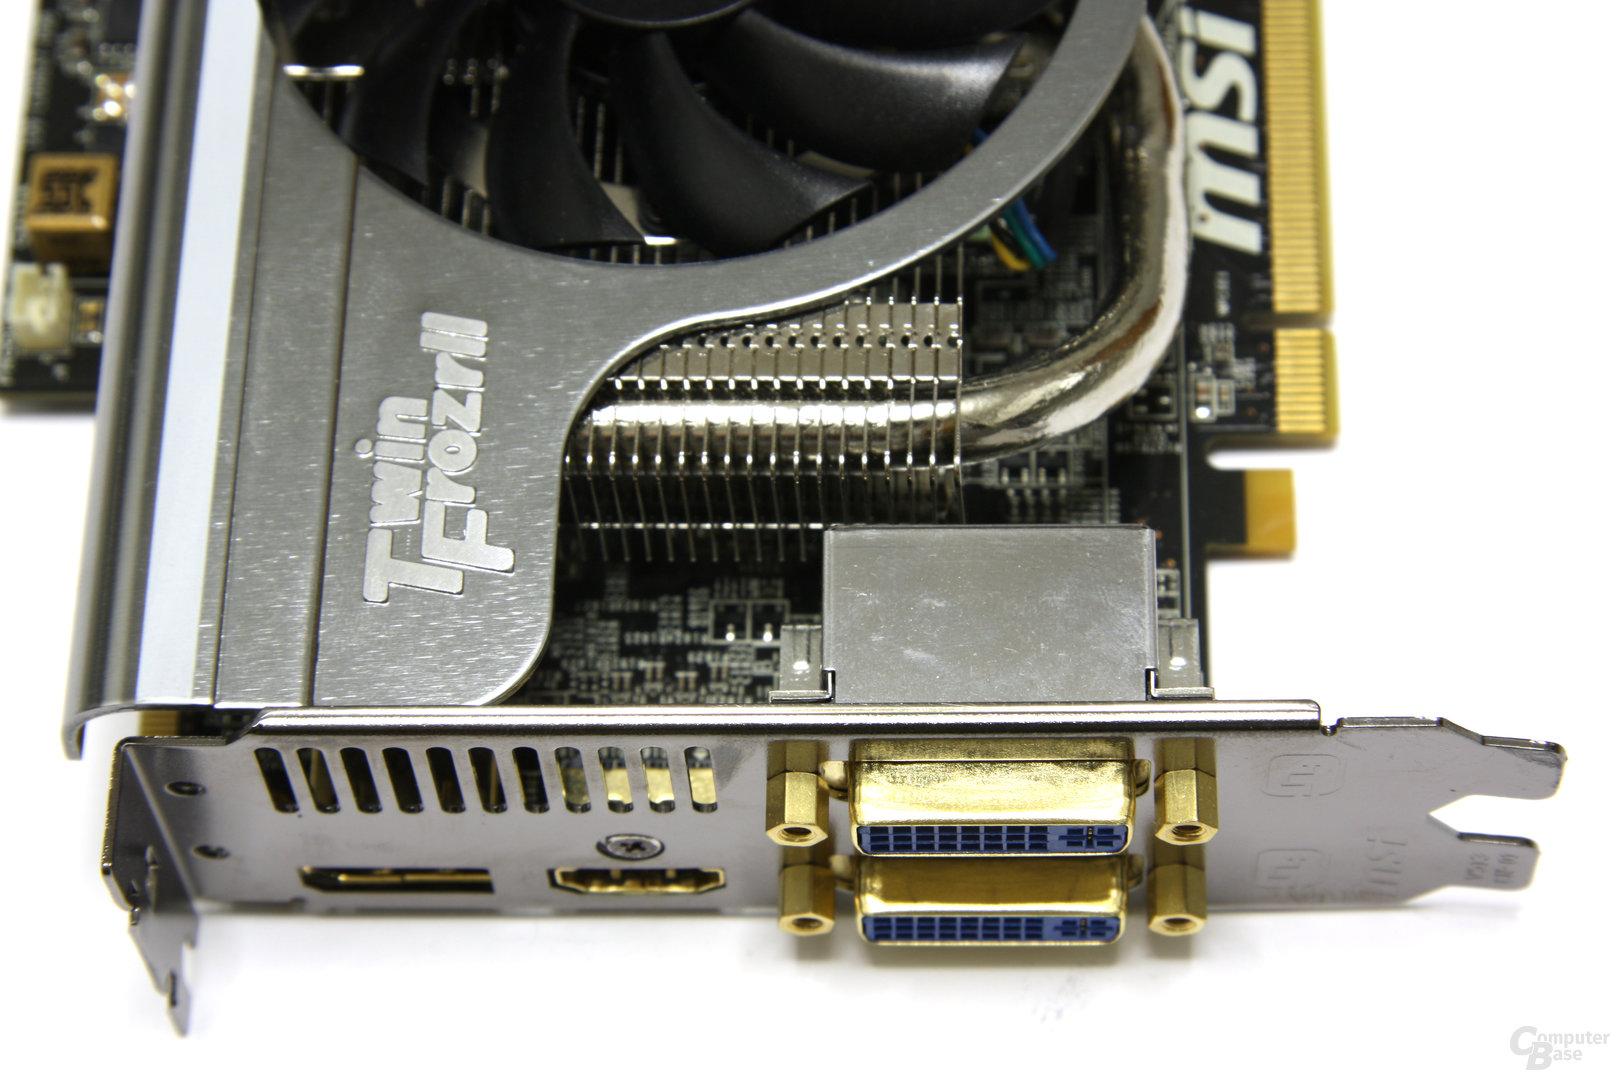 Radeon HD 5870 Lightning Anschlüsse